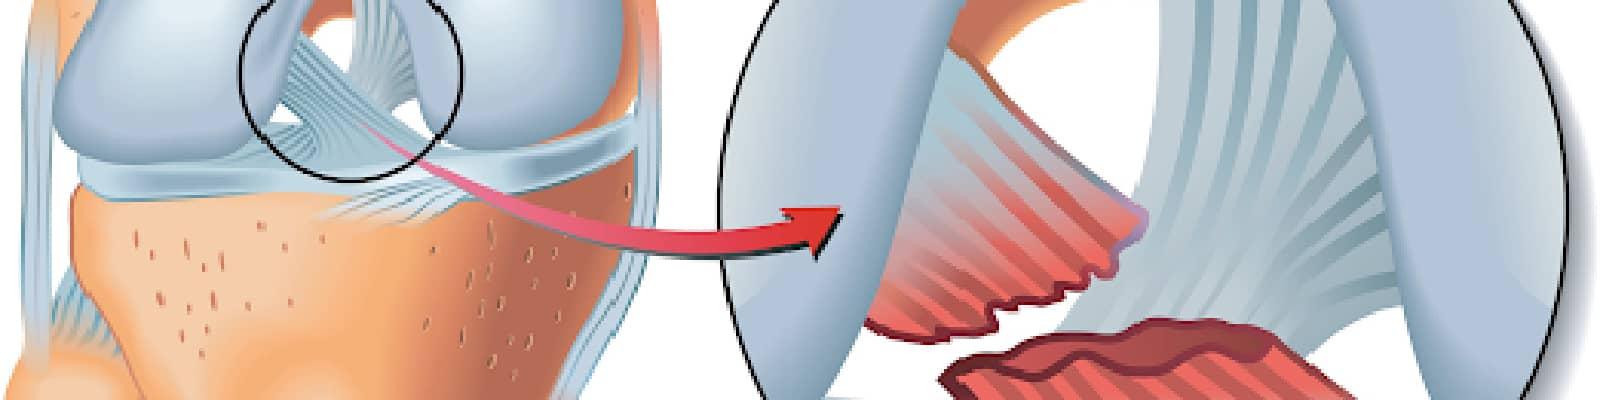 Rotura de ligamento lateral interno